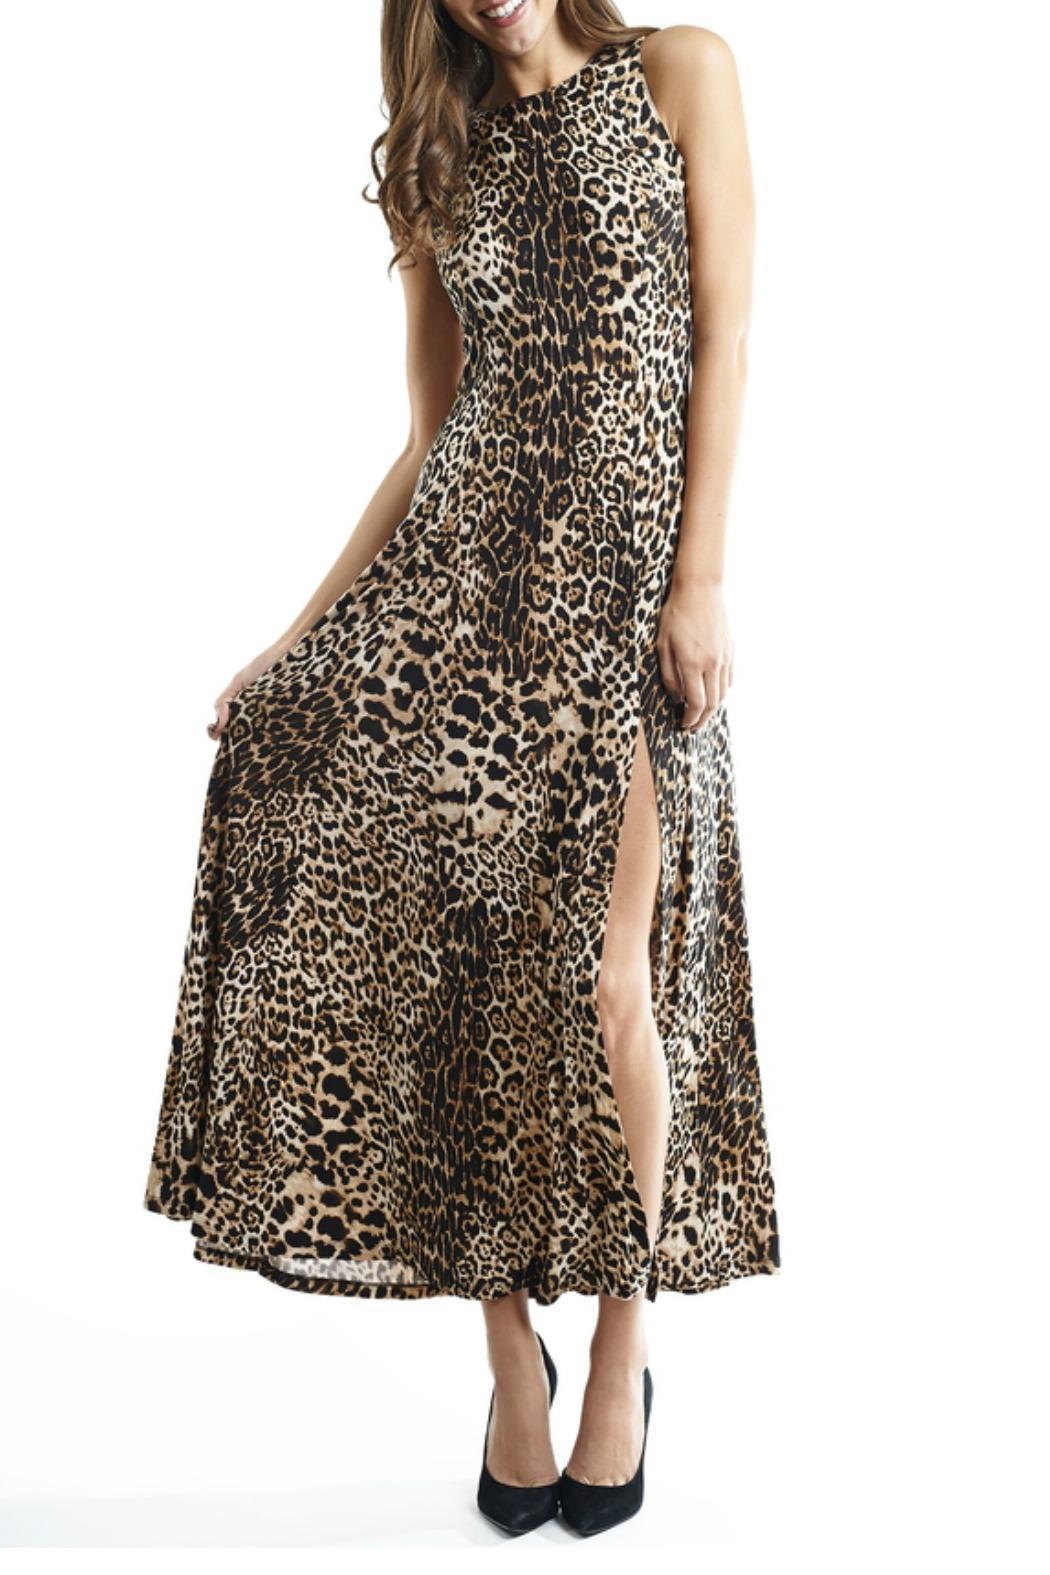 JOSEPH RIBKOFF Leopard print maxi dress | The Volte